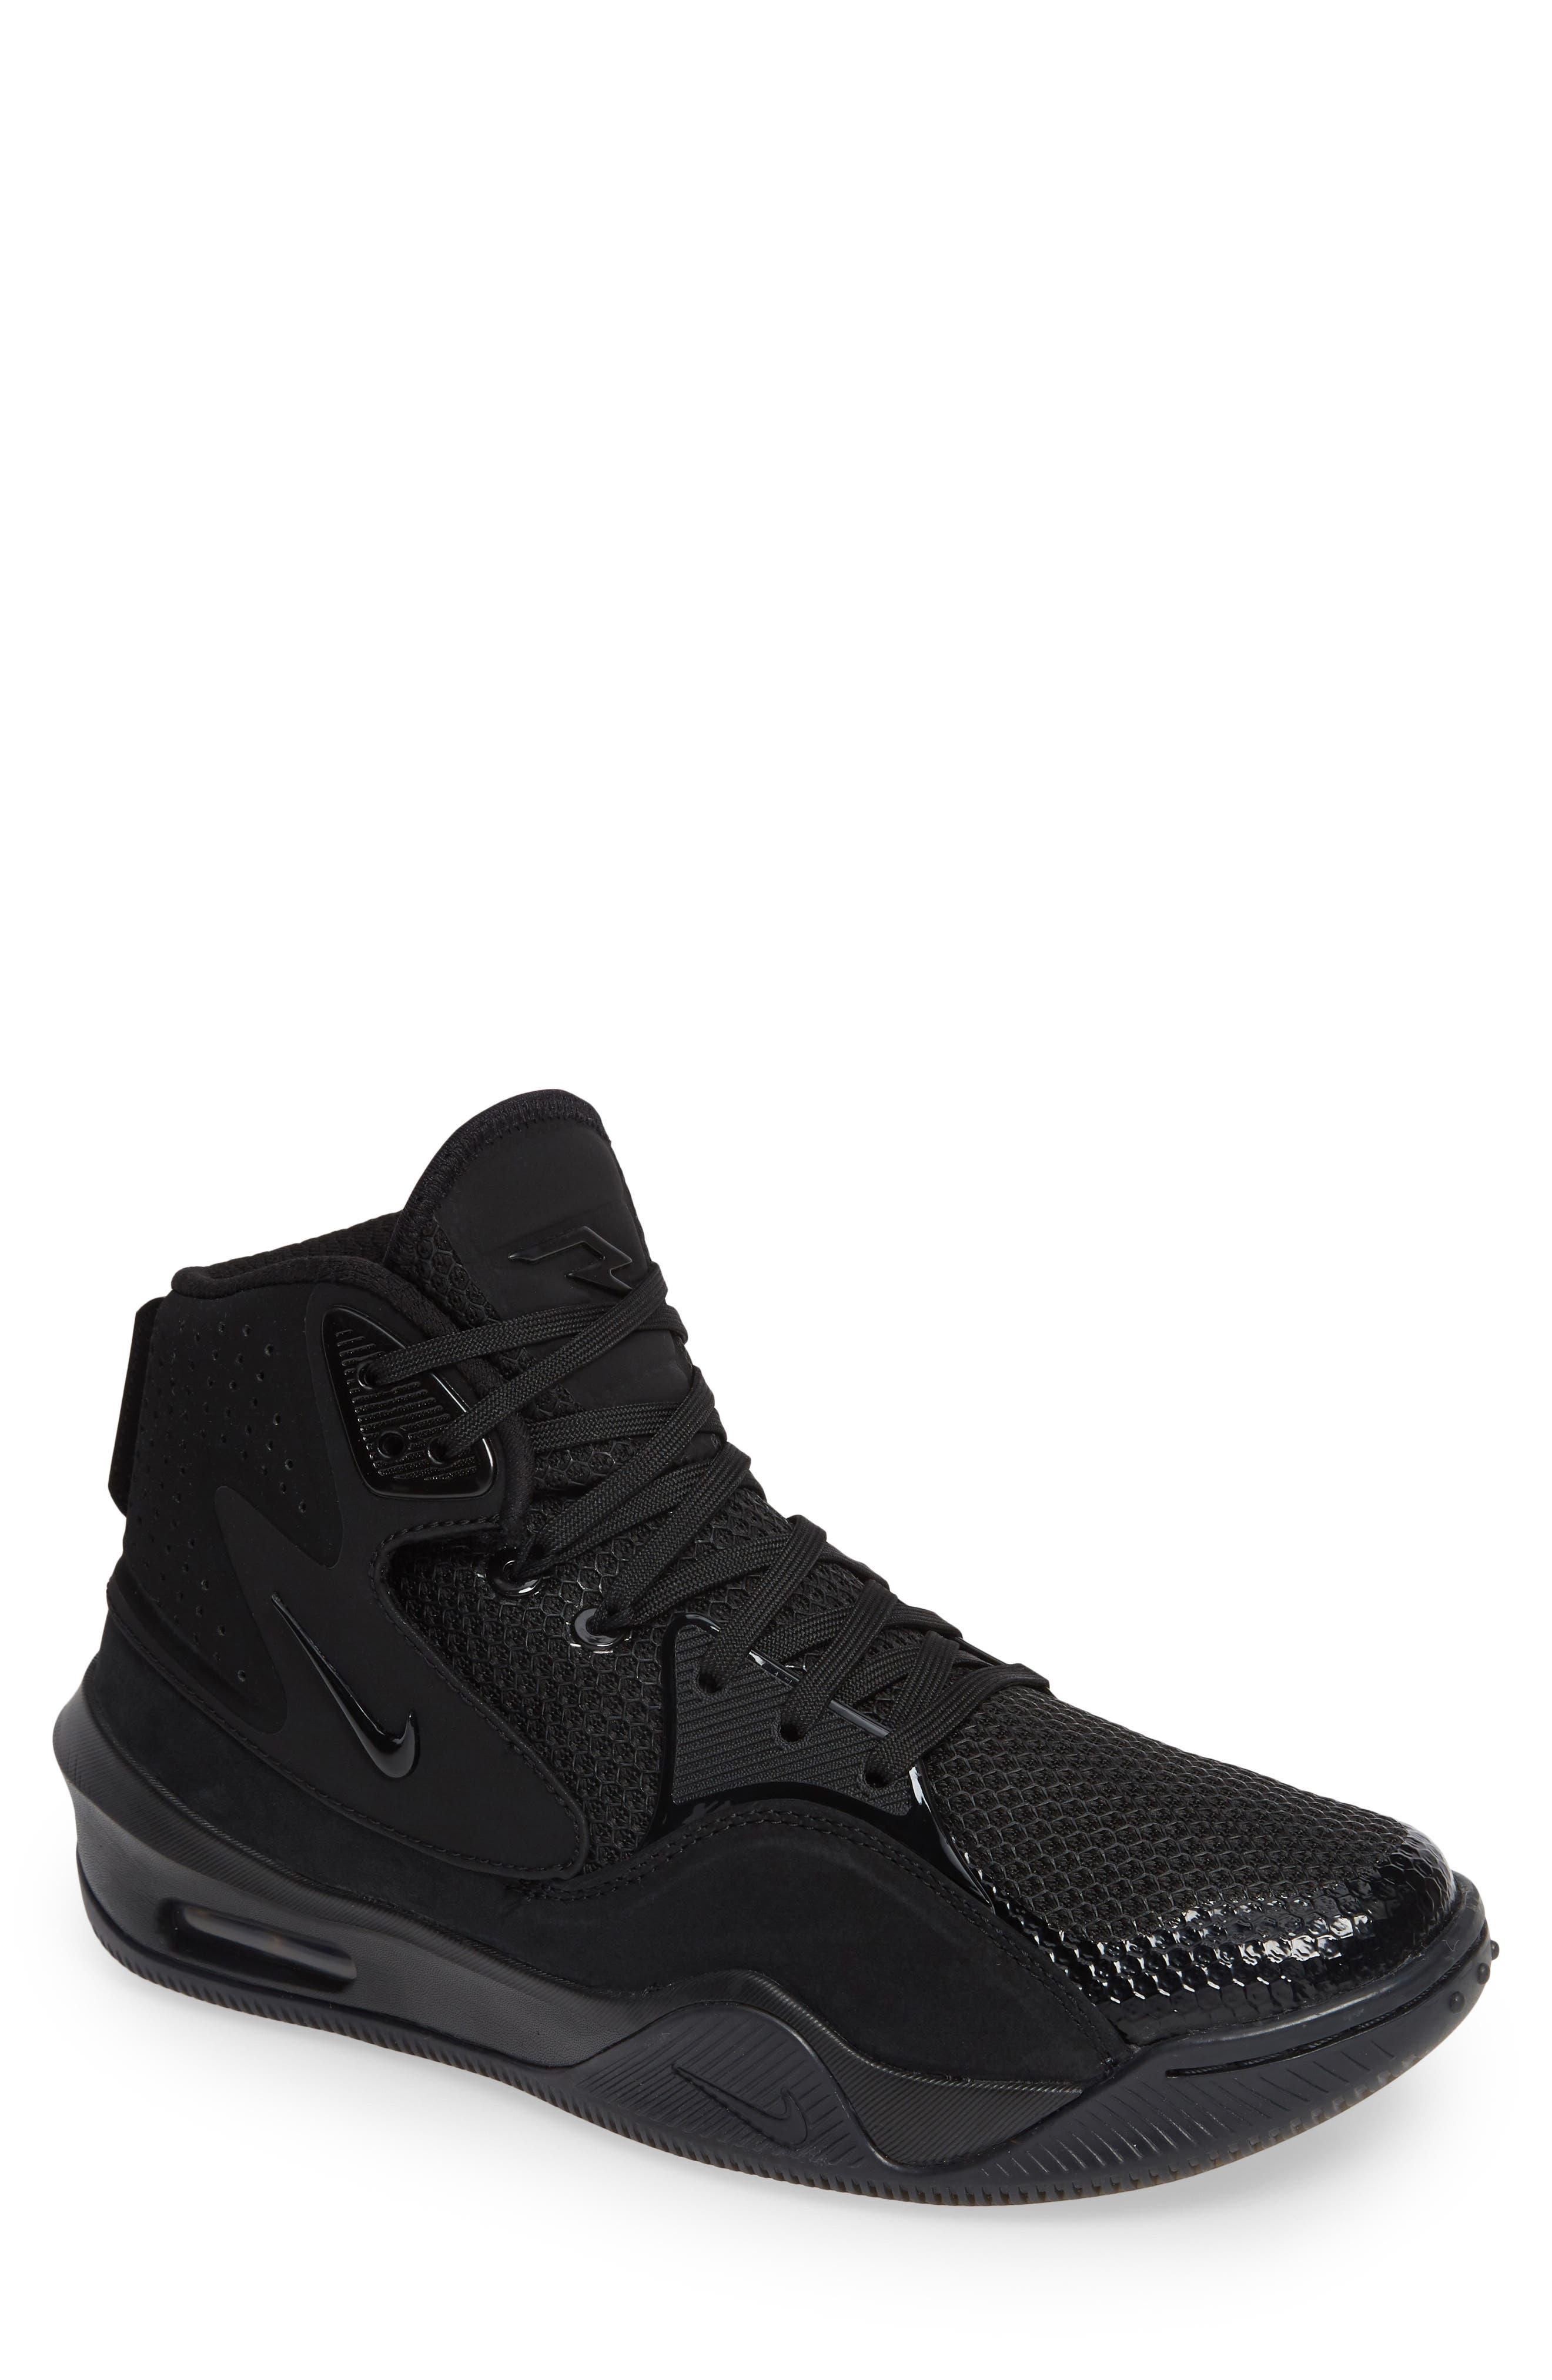 Dangeruss Wilson 1 Sneaker,                             Main thumbnail 1, color,                             BLACK/ METALLIC GOLD